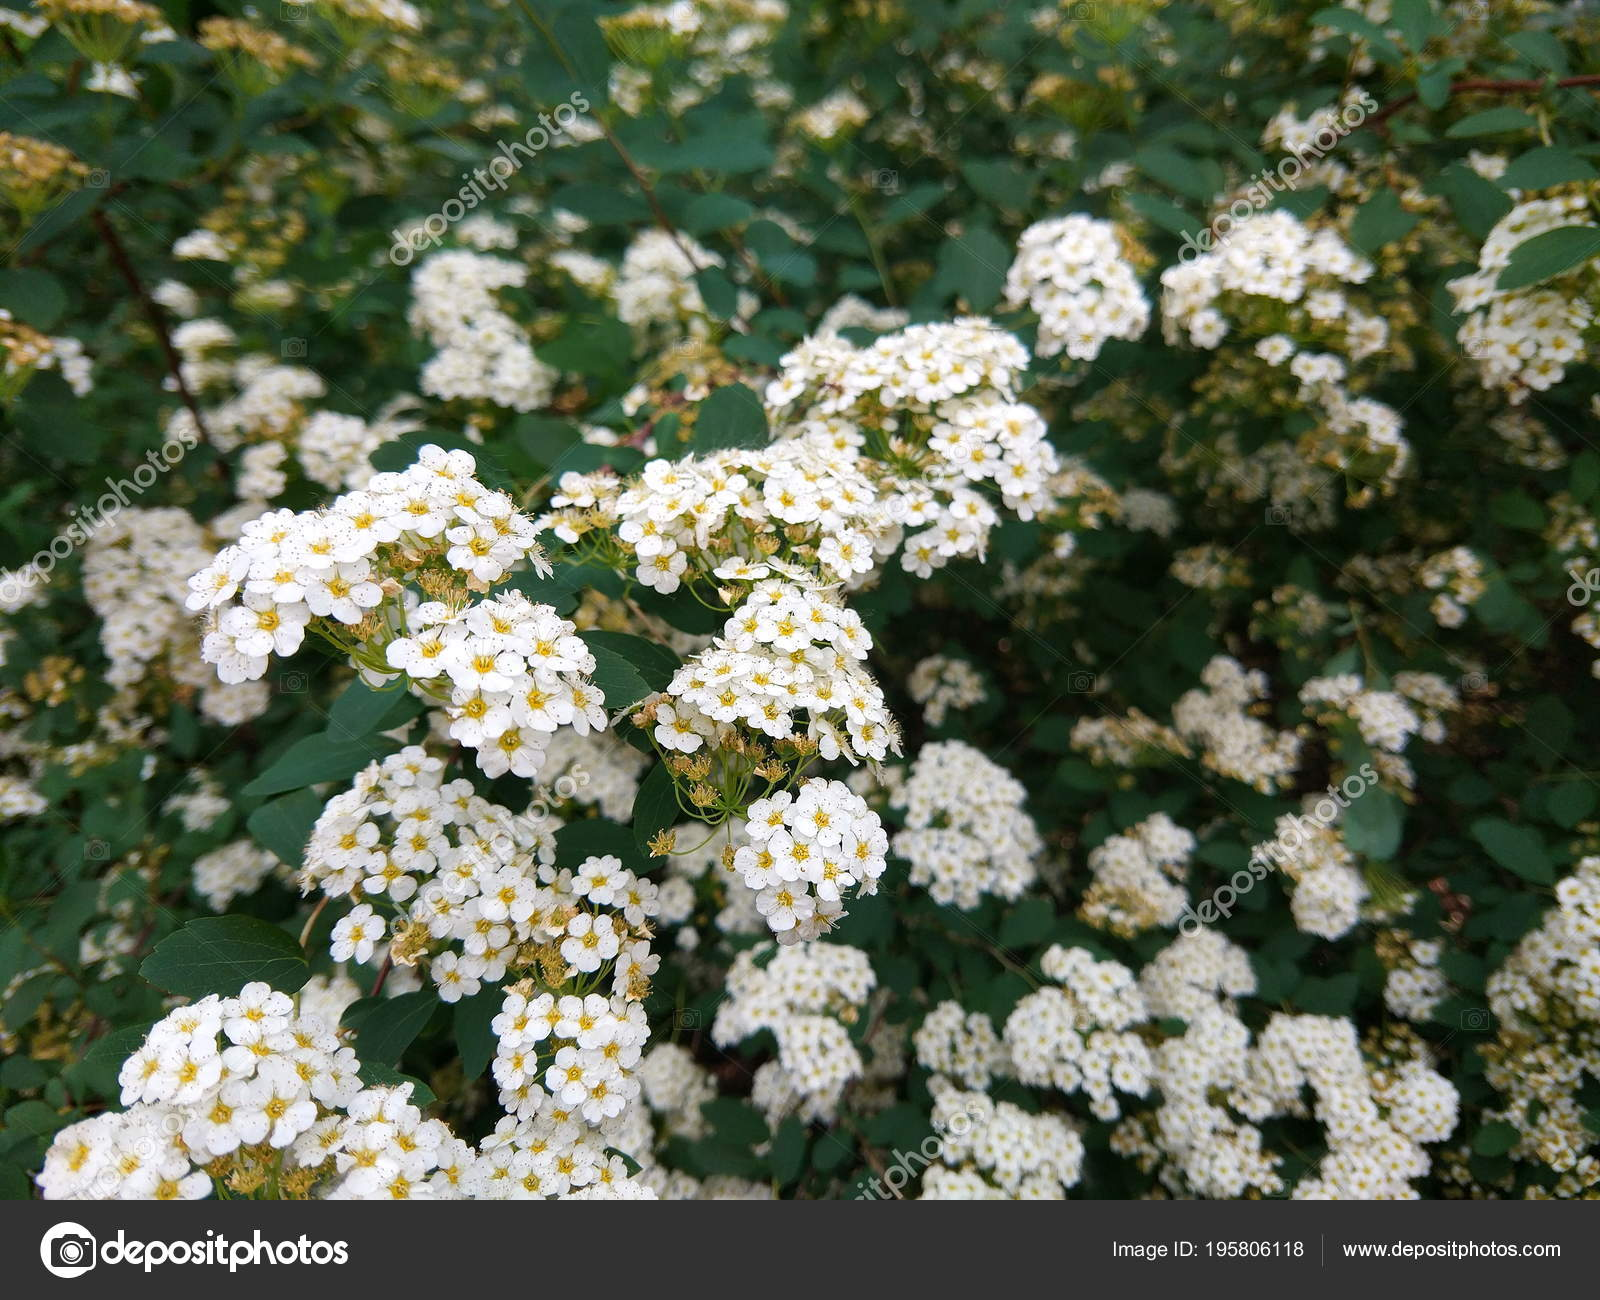 Rosa Multiflora Flowers Garden Small White Flowers Bushes Botanical